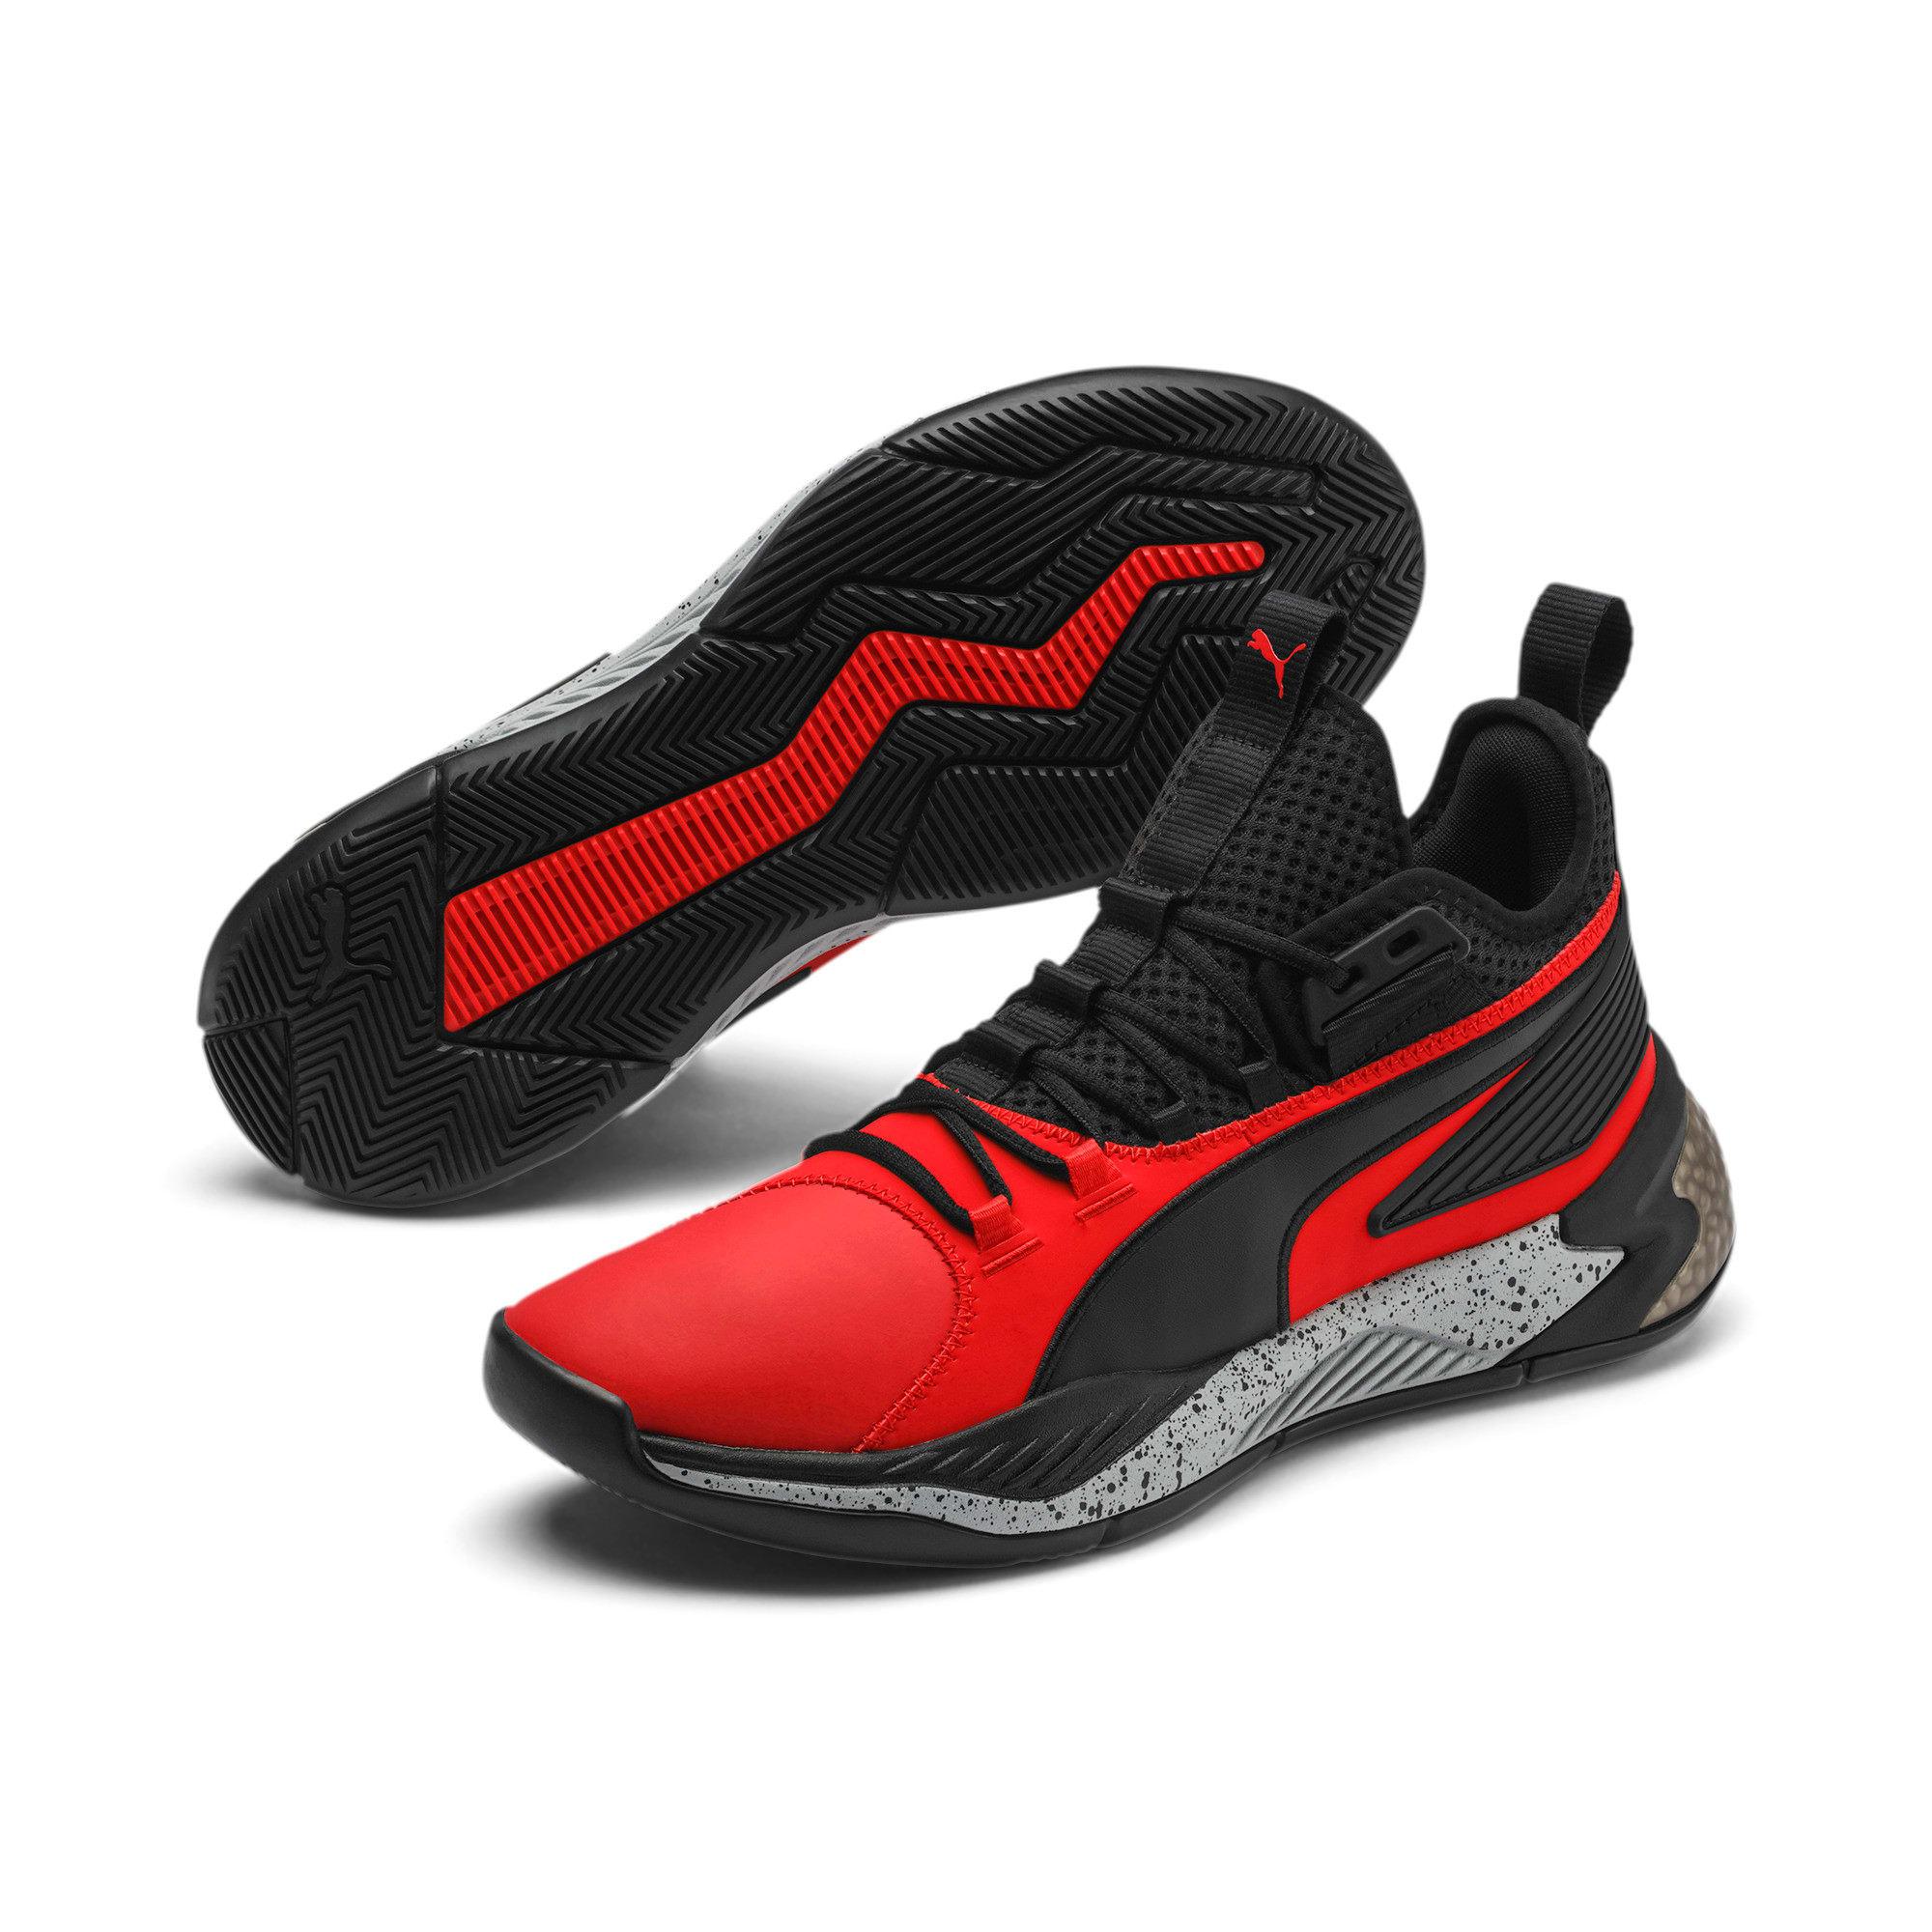 Thumbnail 2 of Uproar Core Men's Basketball Shoes, High Risk Red-Puma Black, medium